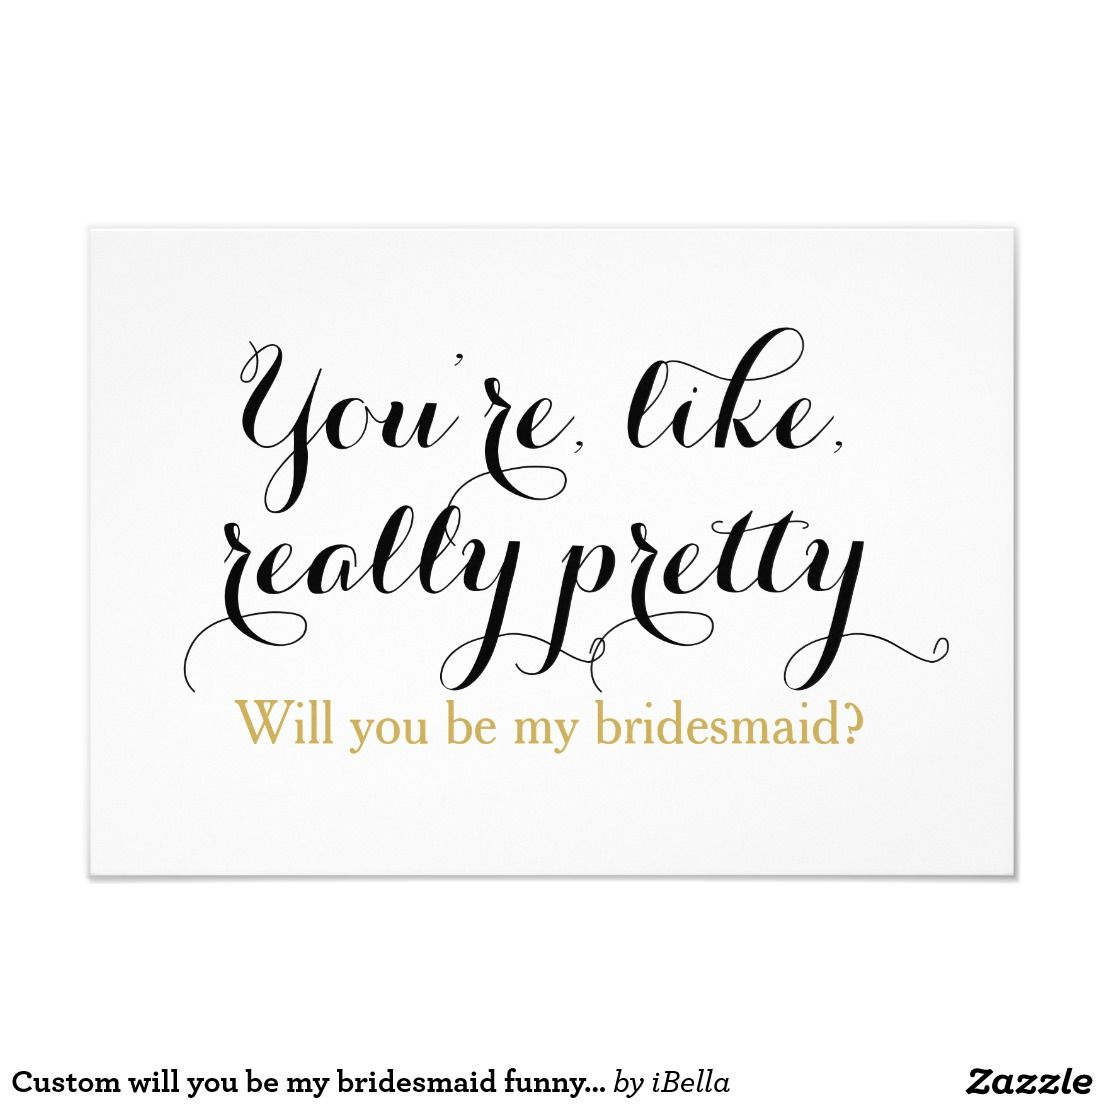 Custom will you be my bridesmaid funny wedding card | Weddings ...